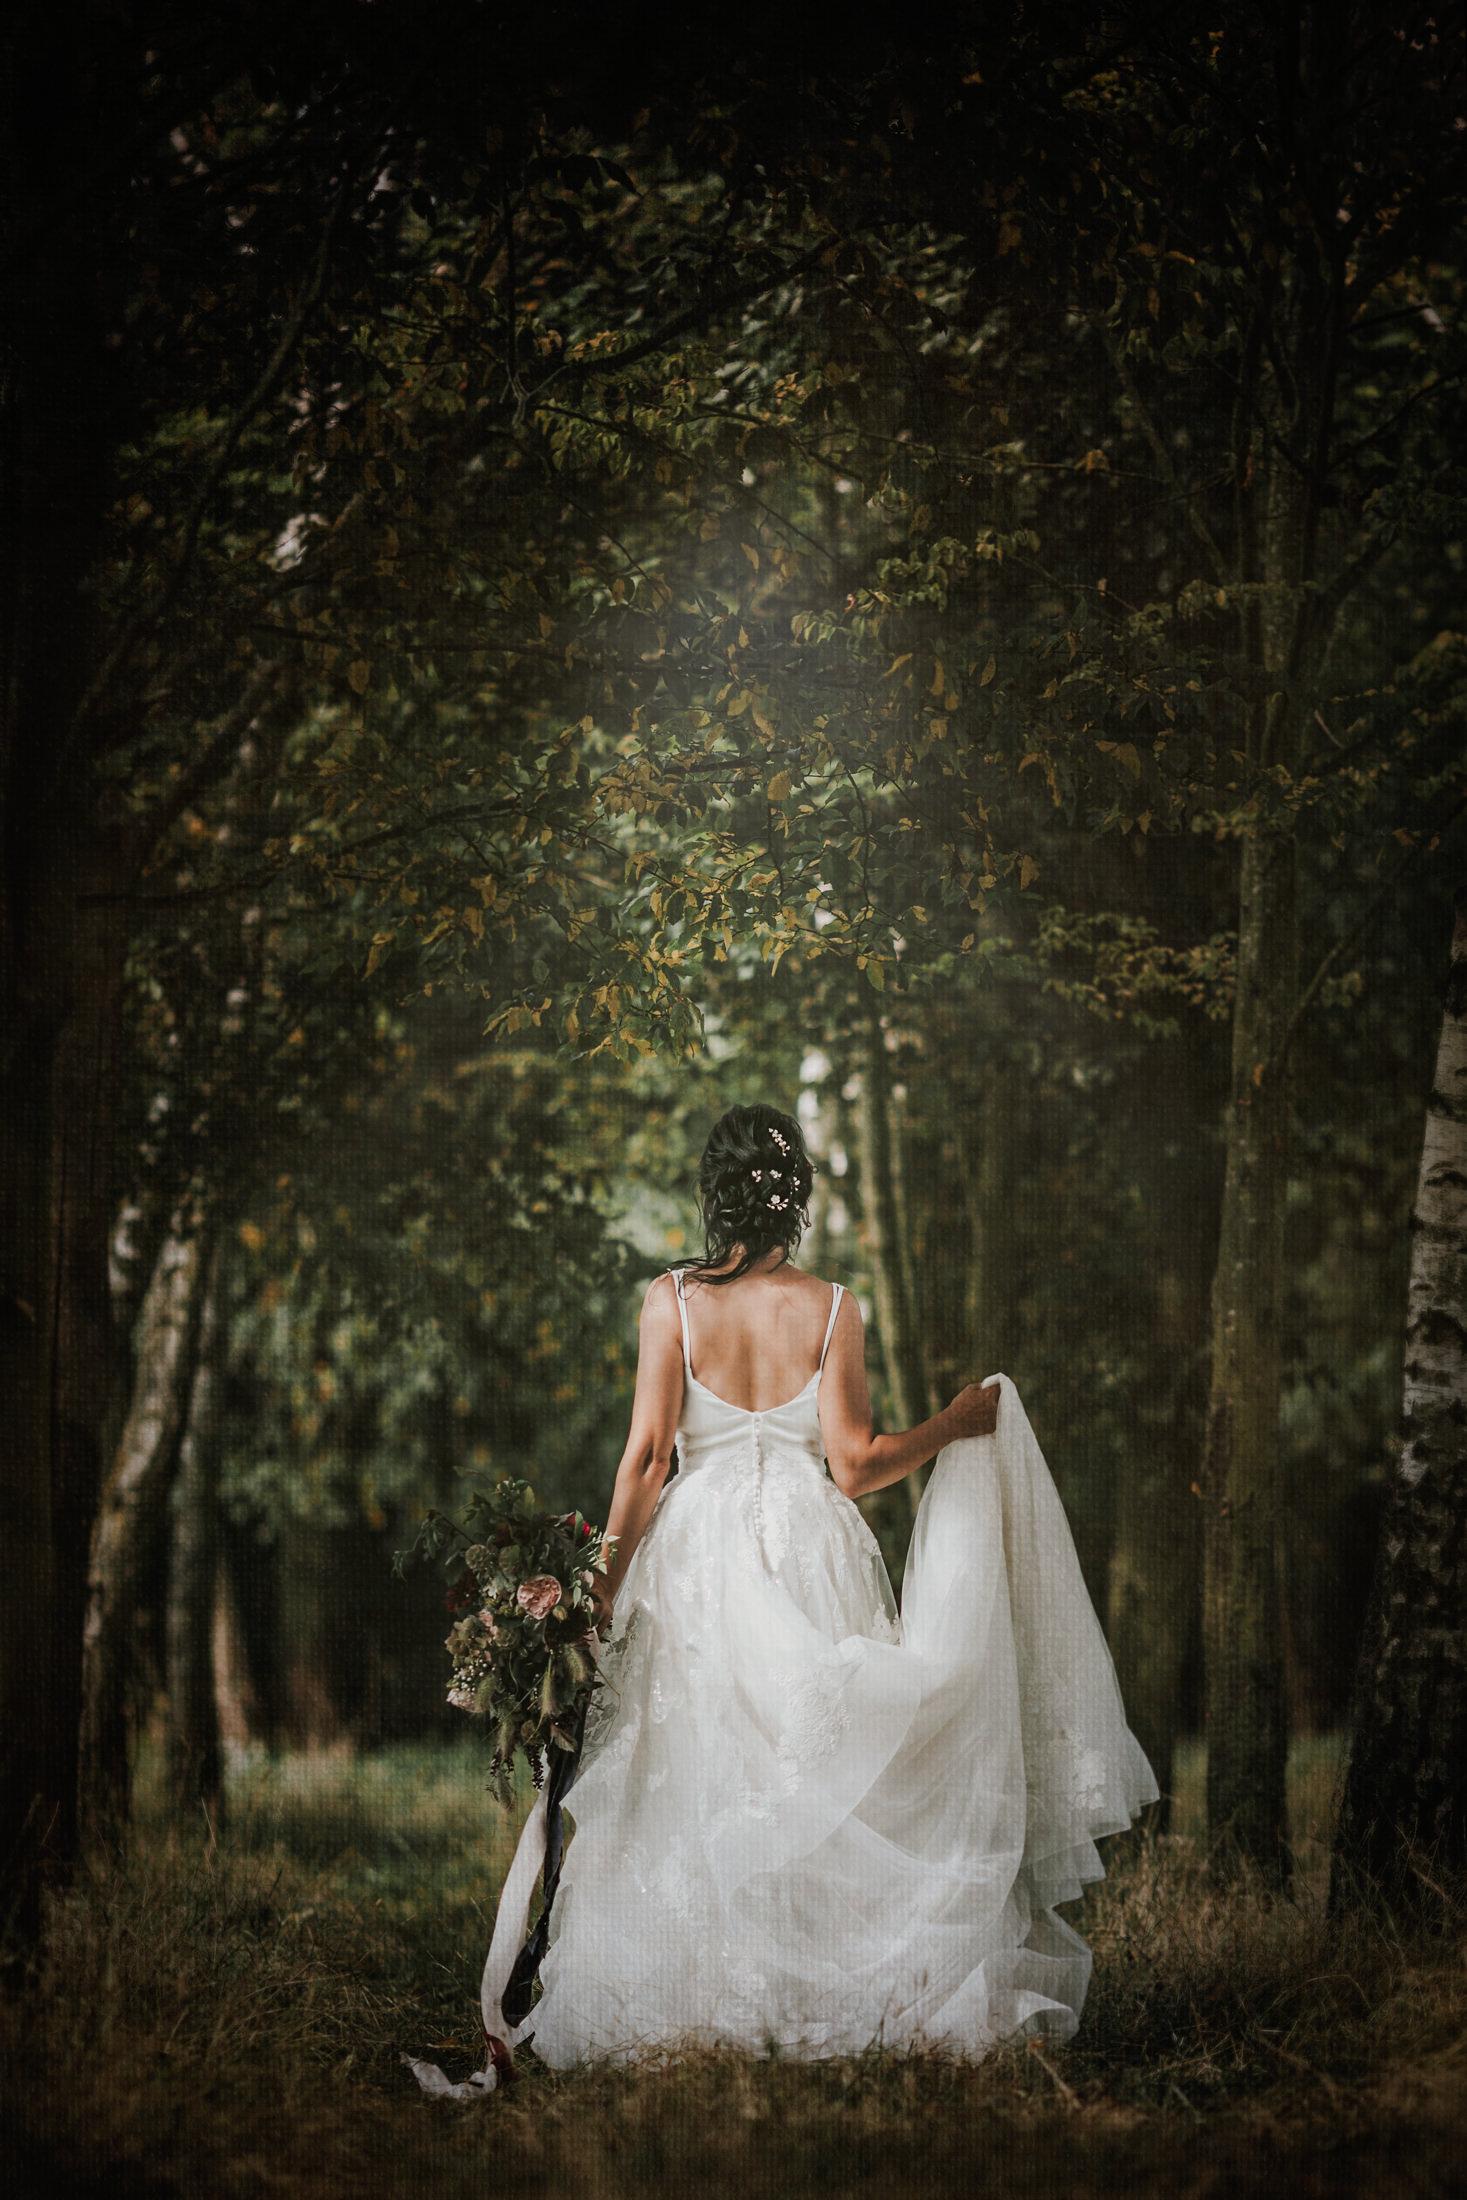 Woodland Wedding - nottingham outdoor wedding venue - east midlands wedding planner - forest wedding - artistic wedding photos